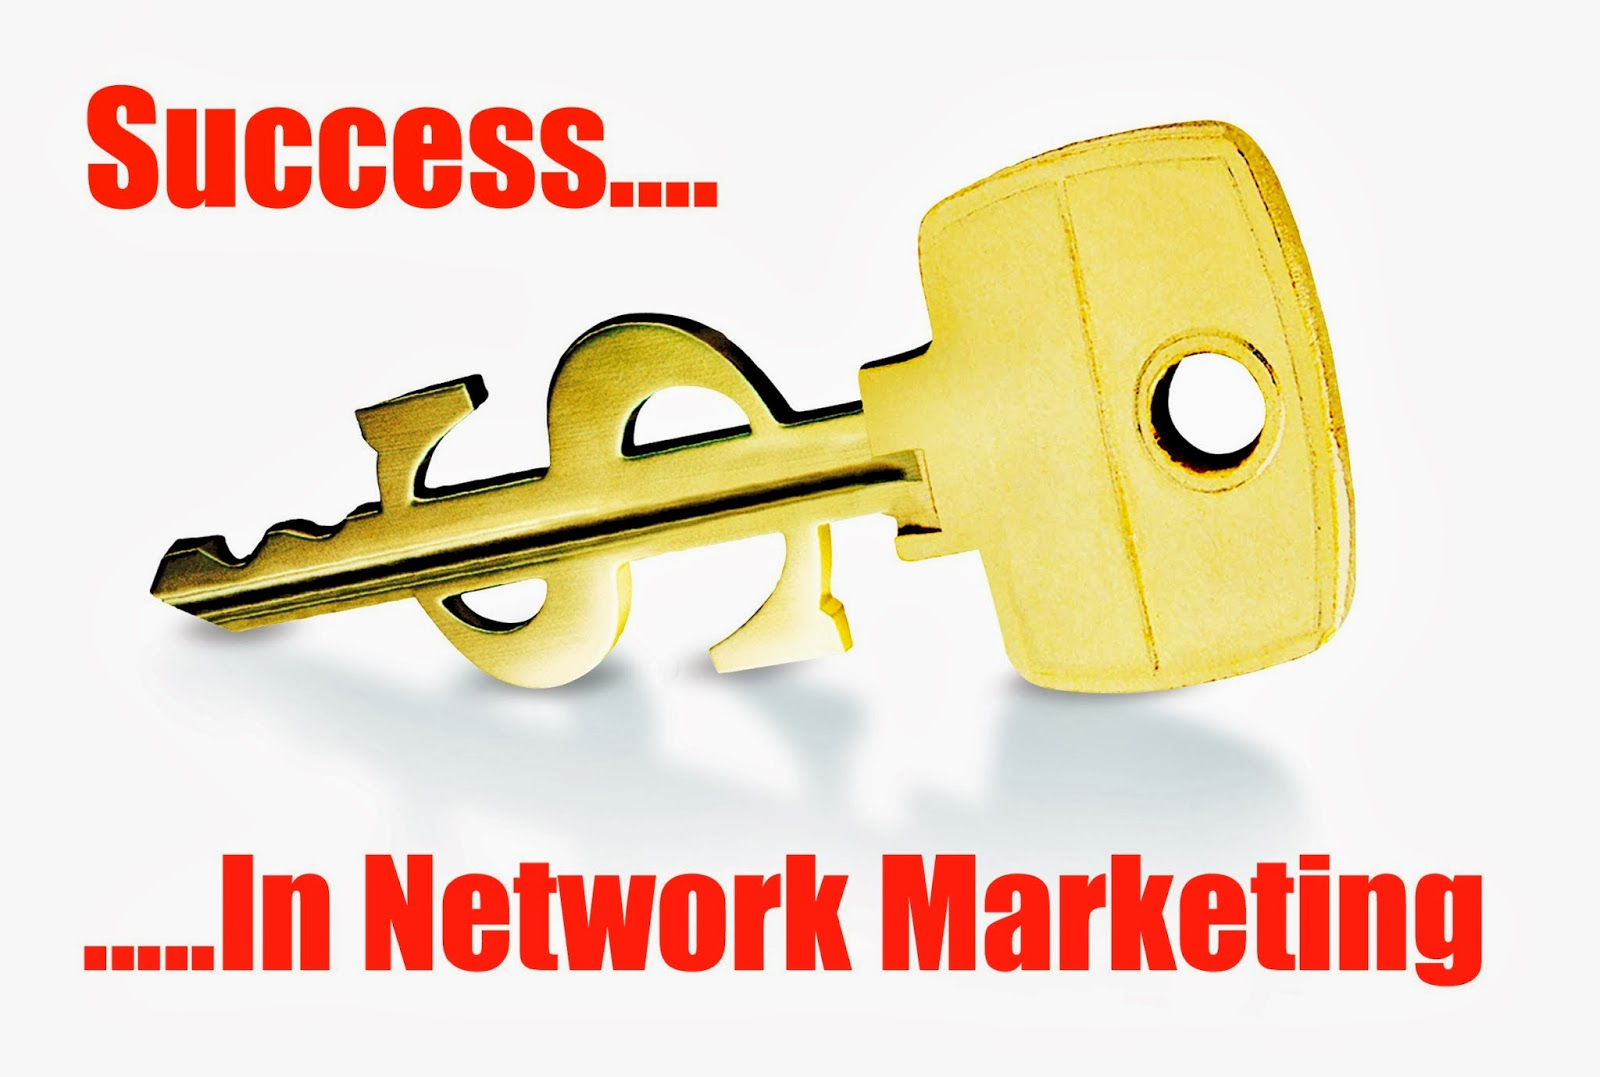 Hati hati bisnis MLM | PT. Veritra Sentosa International ...